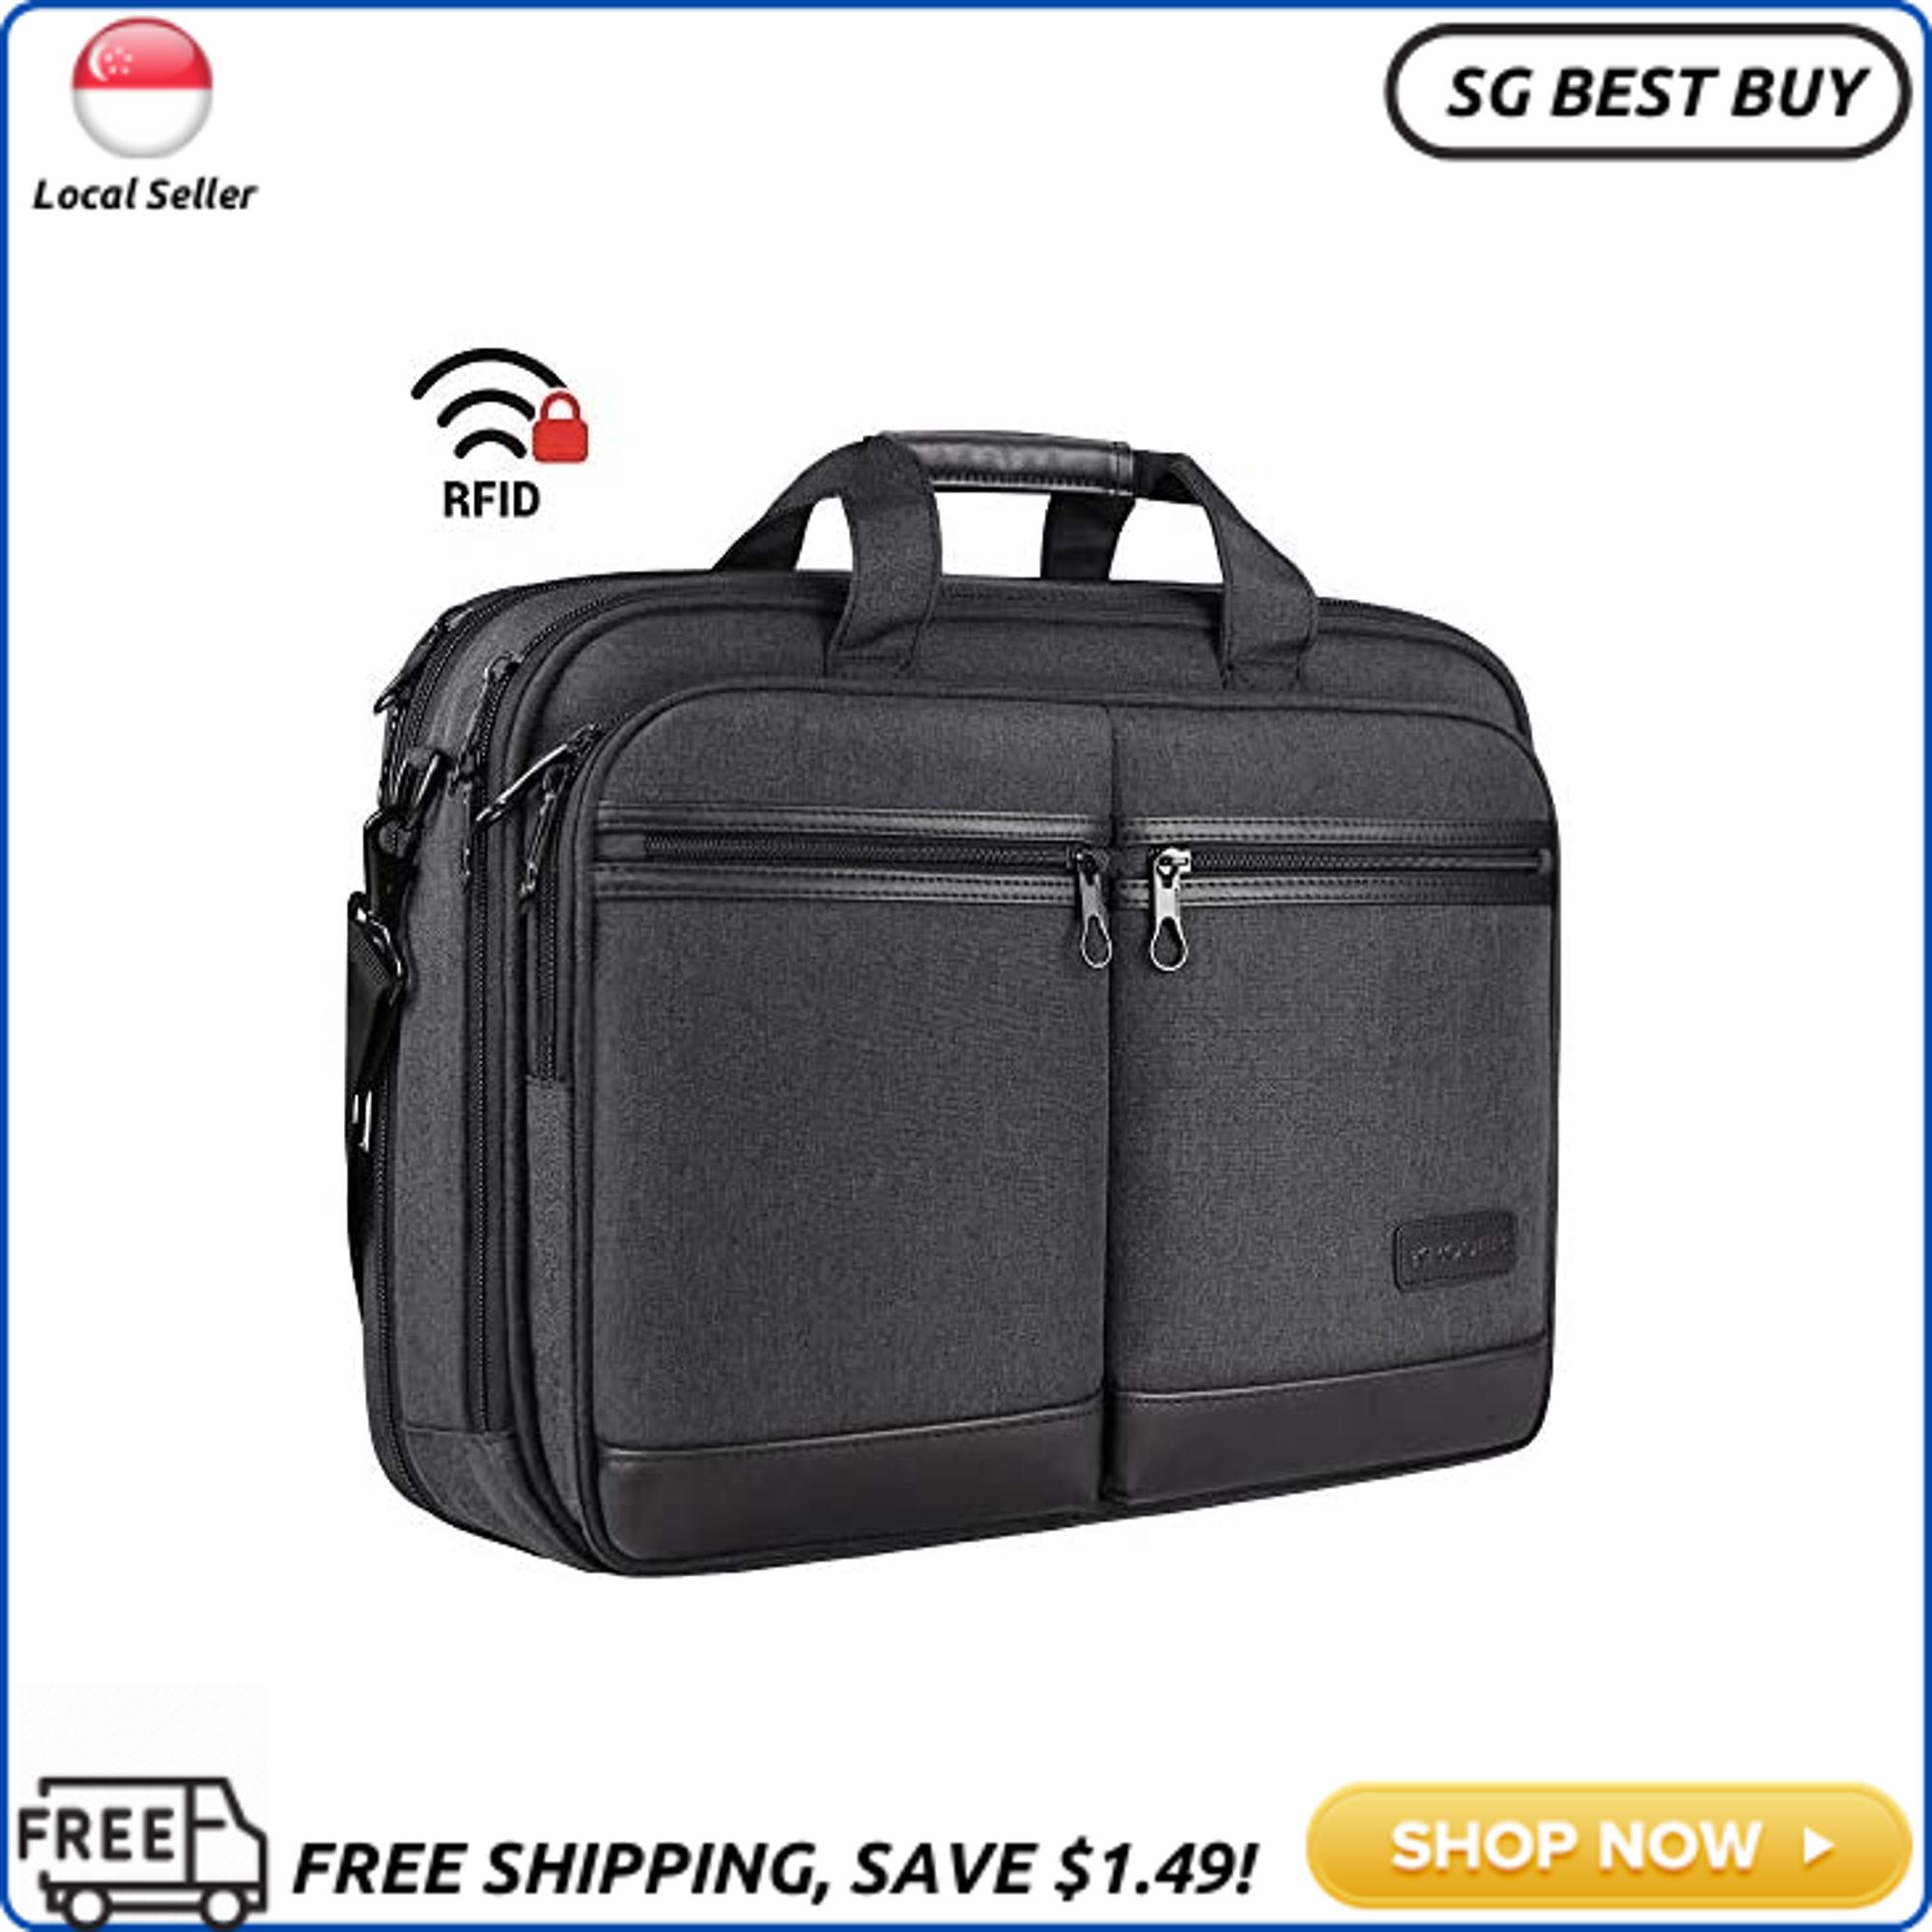 (SG SELLER) KROSER 18 Laptop Bag Stylish Laptop Briefcase Fits Up to 17.3 Inch Expandable Water-Repellent Shoulder Messenger Bag Computer Bag with RFID Pockets for Business/Travel/School/College/Men/Women-Black